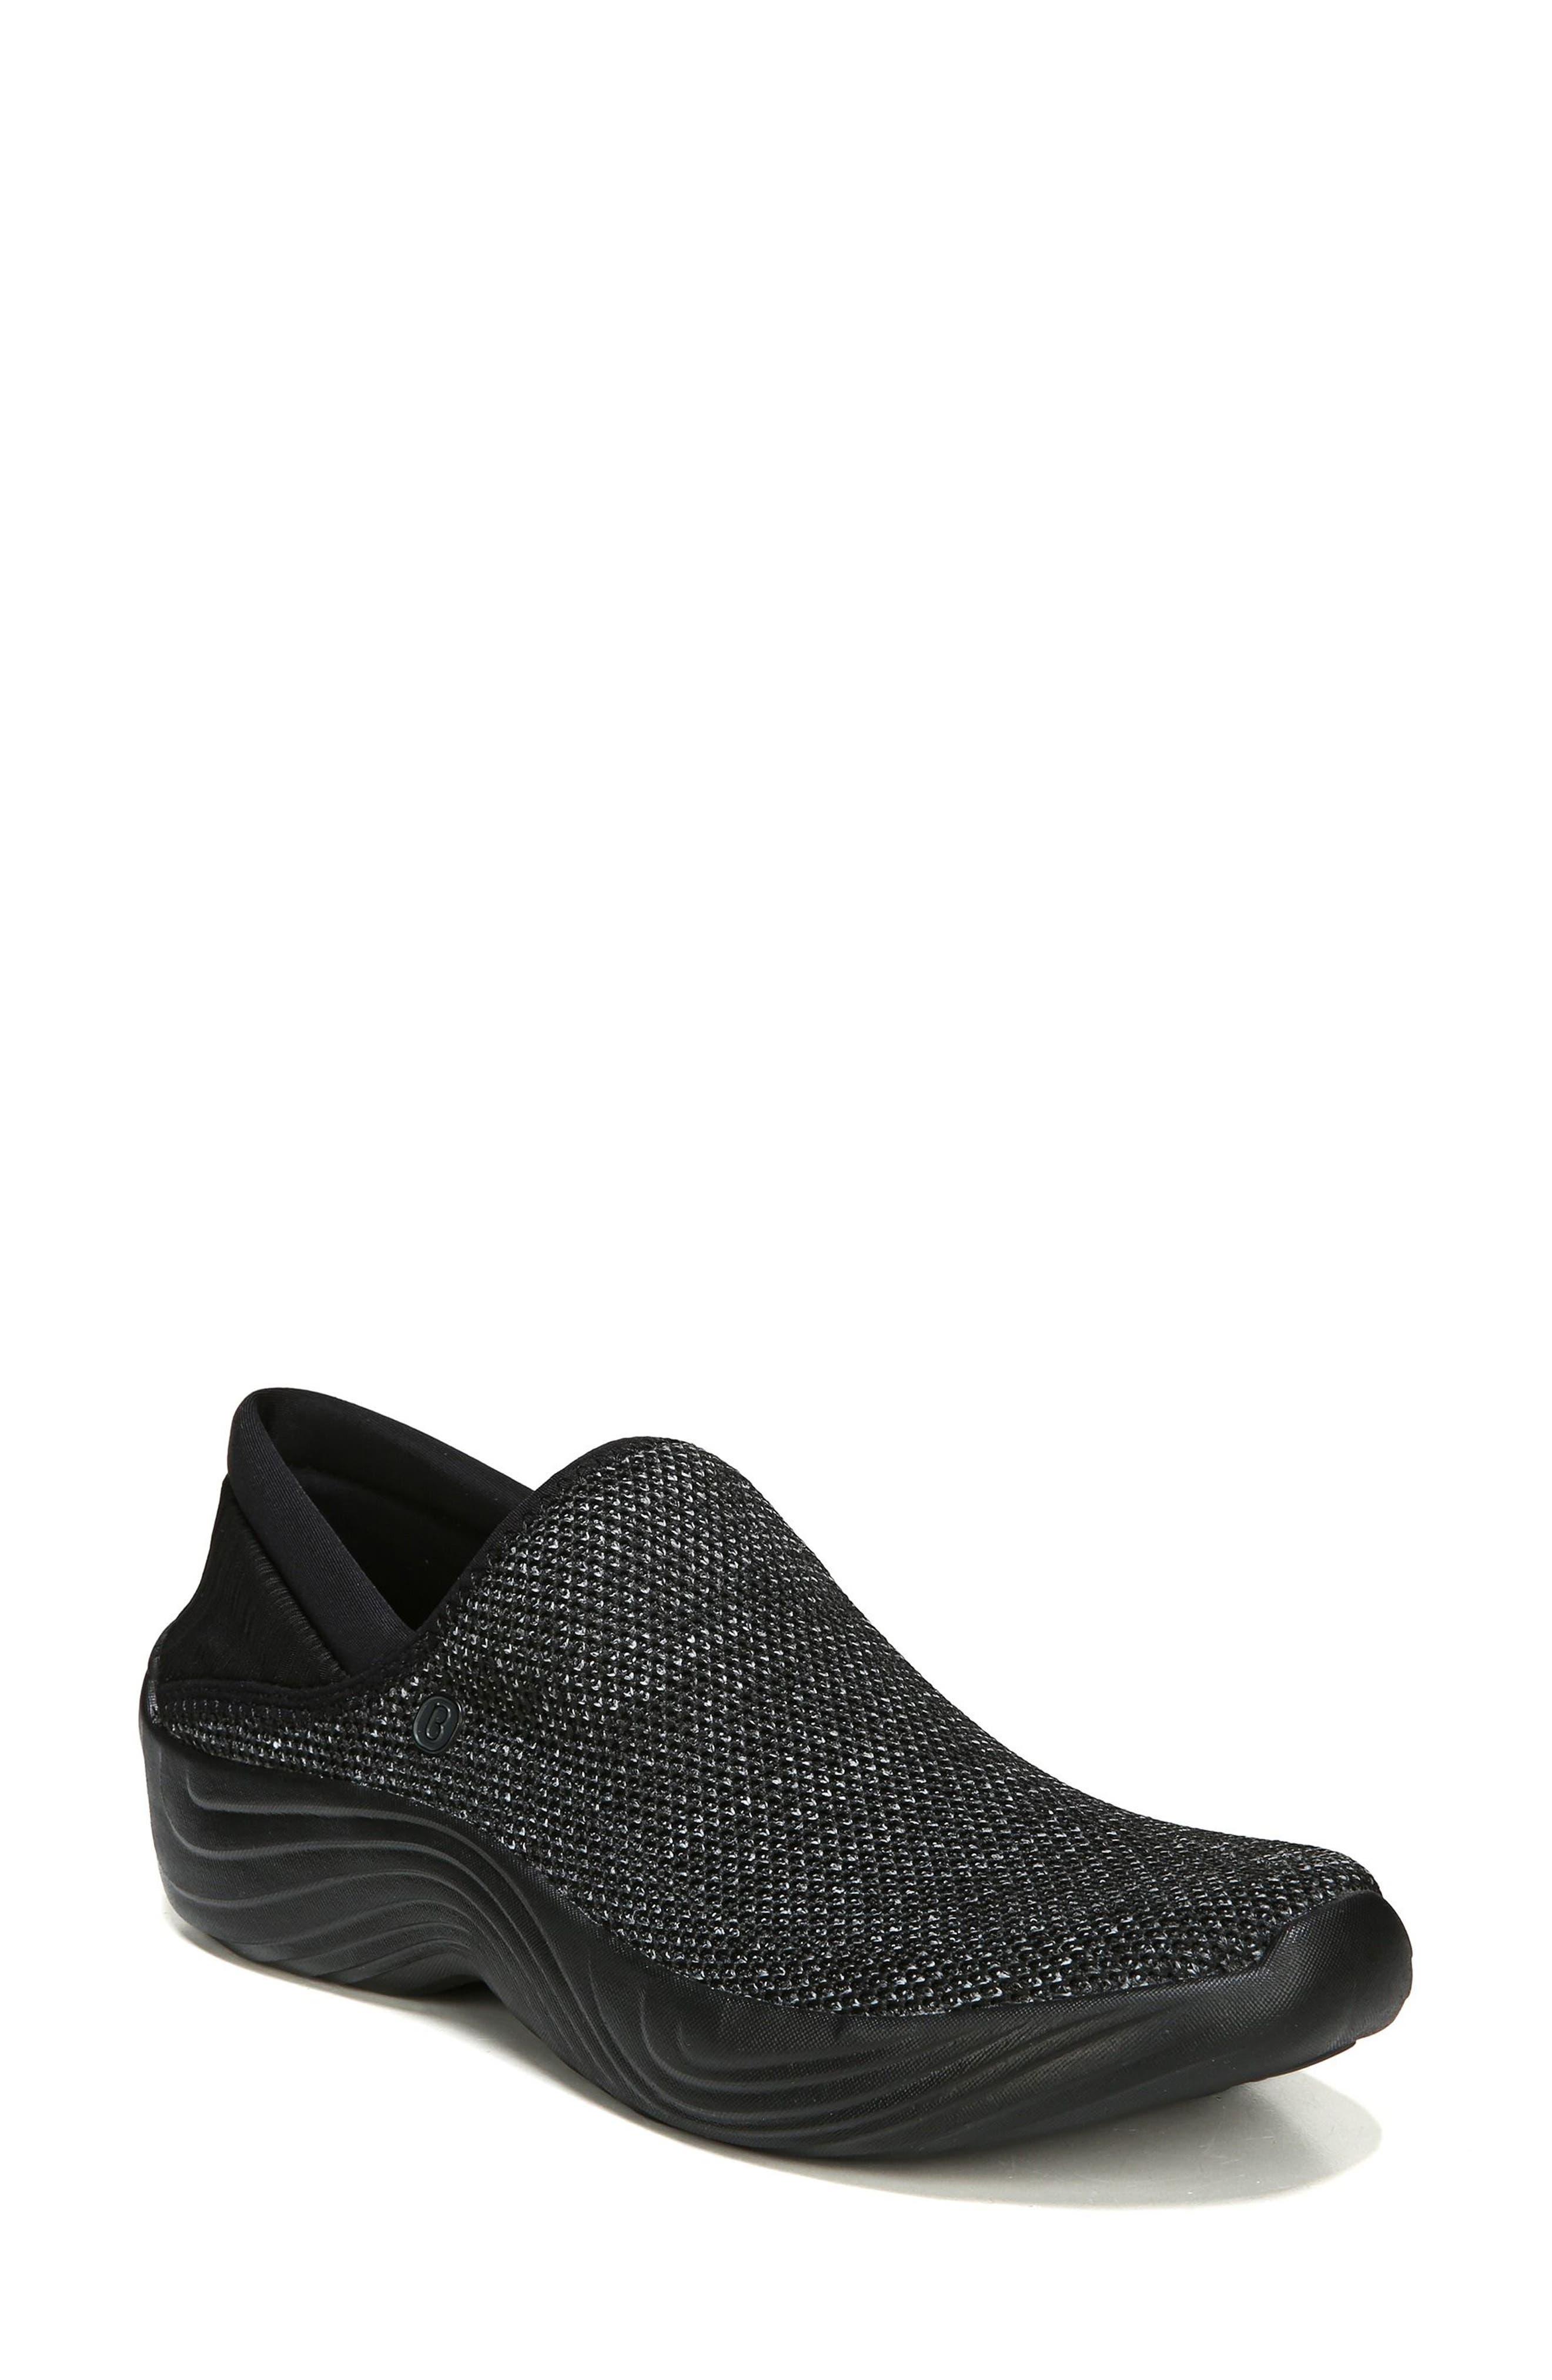 Topaz Slip-On Sneaker,                         Main,                         color, BLACK FABRIC